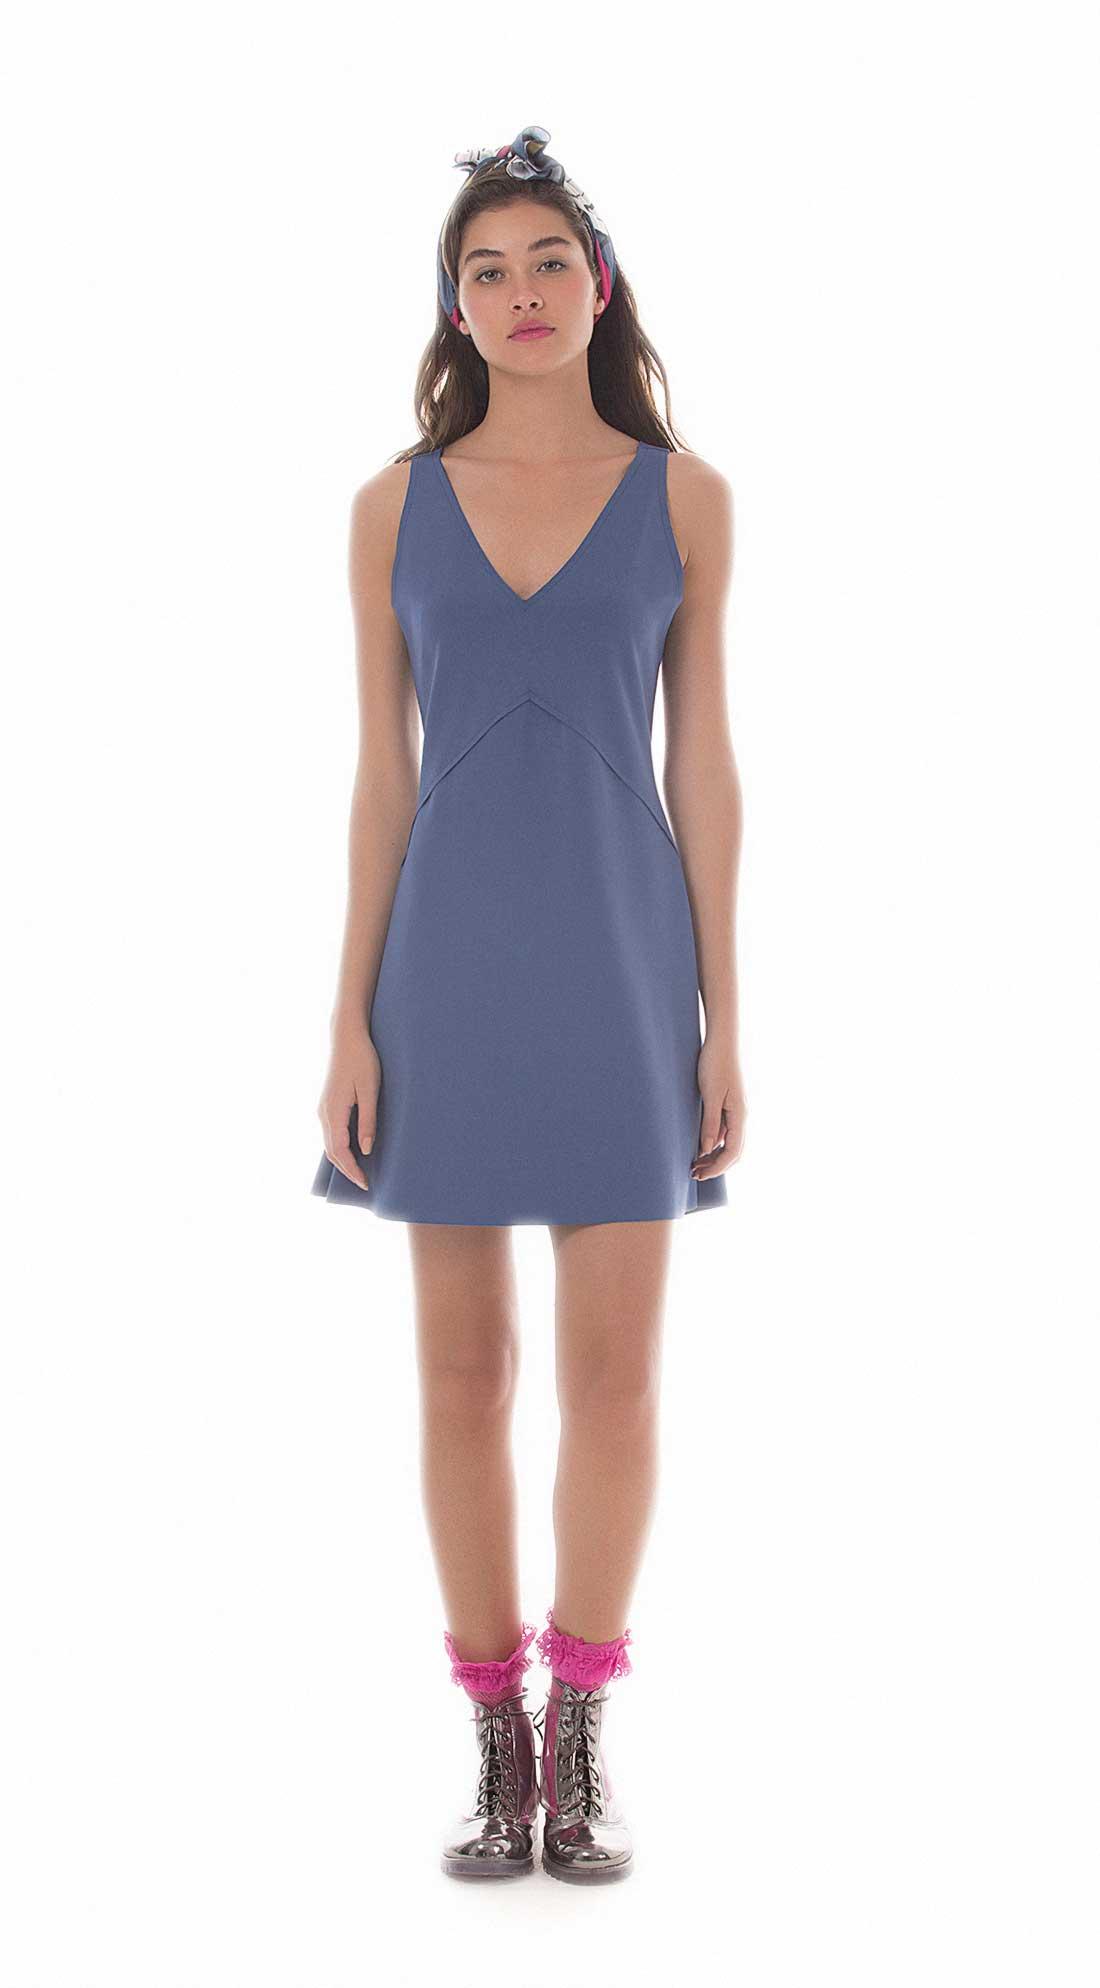 ab6aaa9aa Vestido Curto Decote V Abertura Costas Azul - Zinco